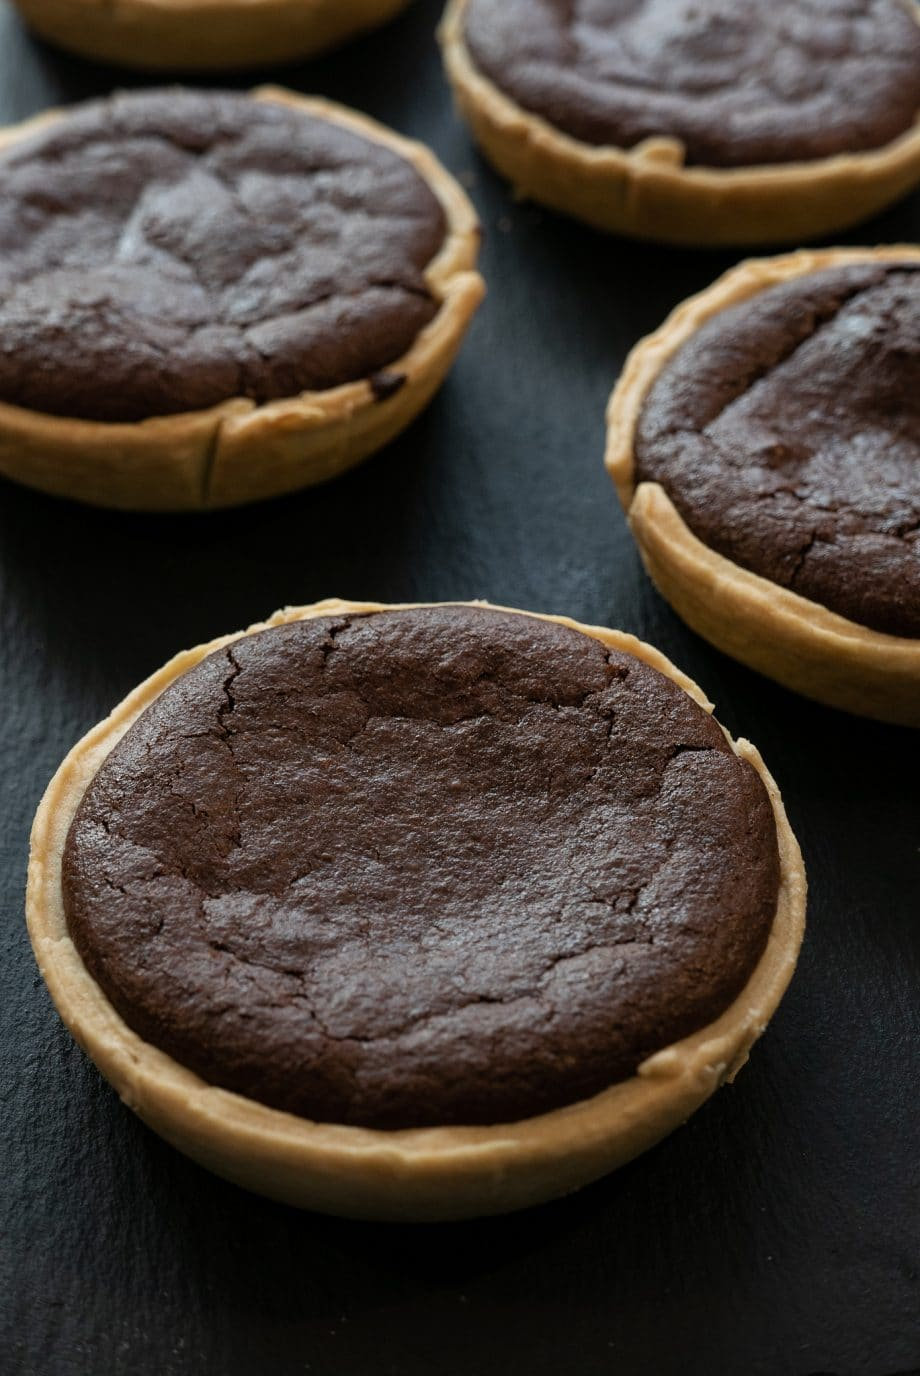 chocolate-fudge-panitier-02